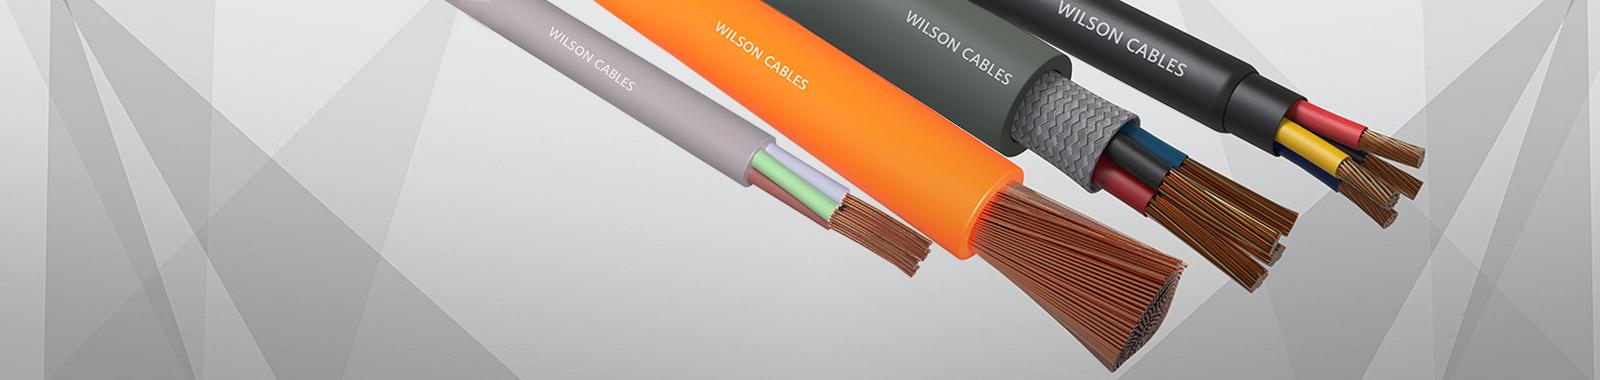 banner-businesses-wilson-cables-v2